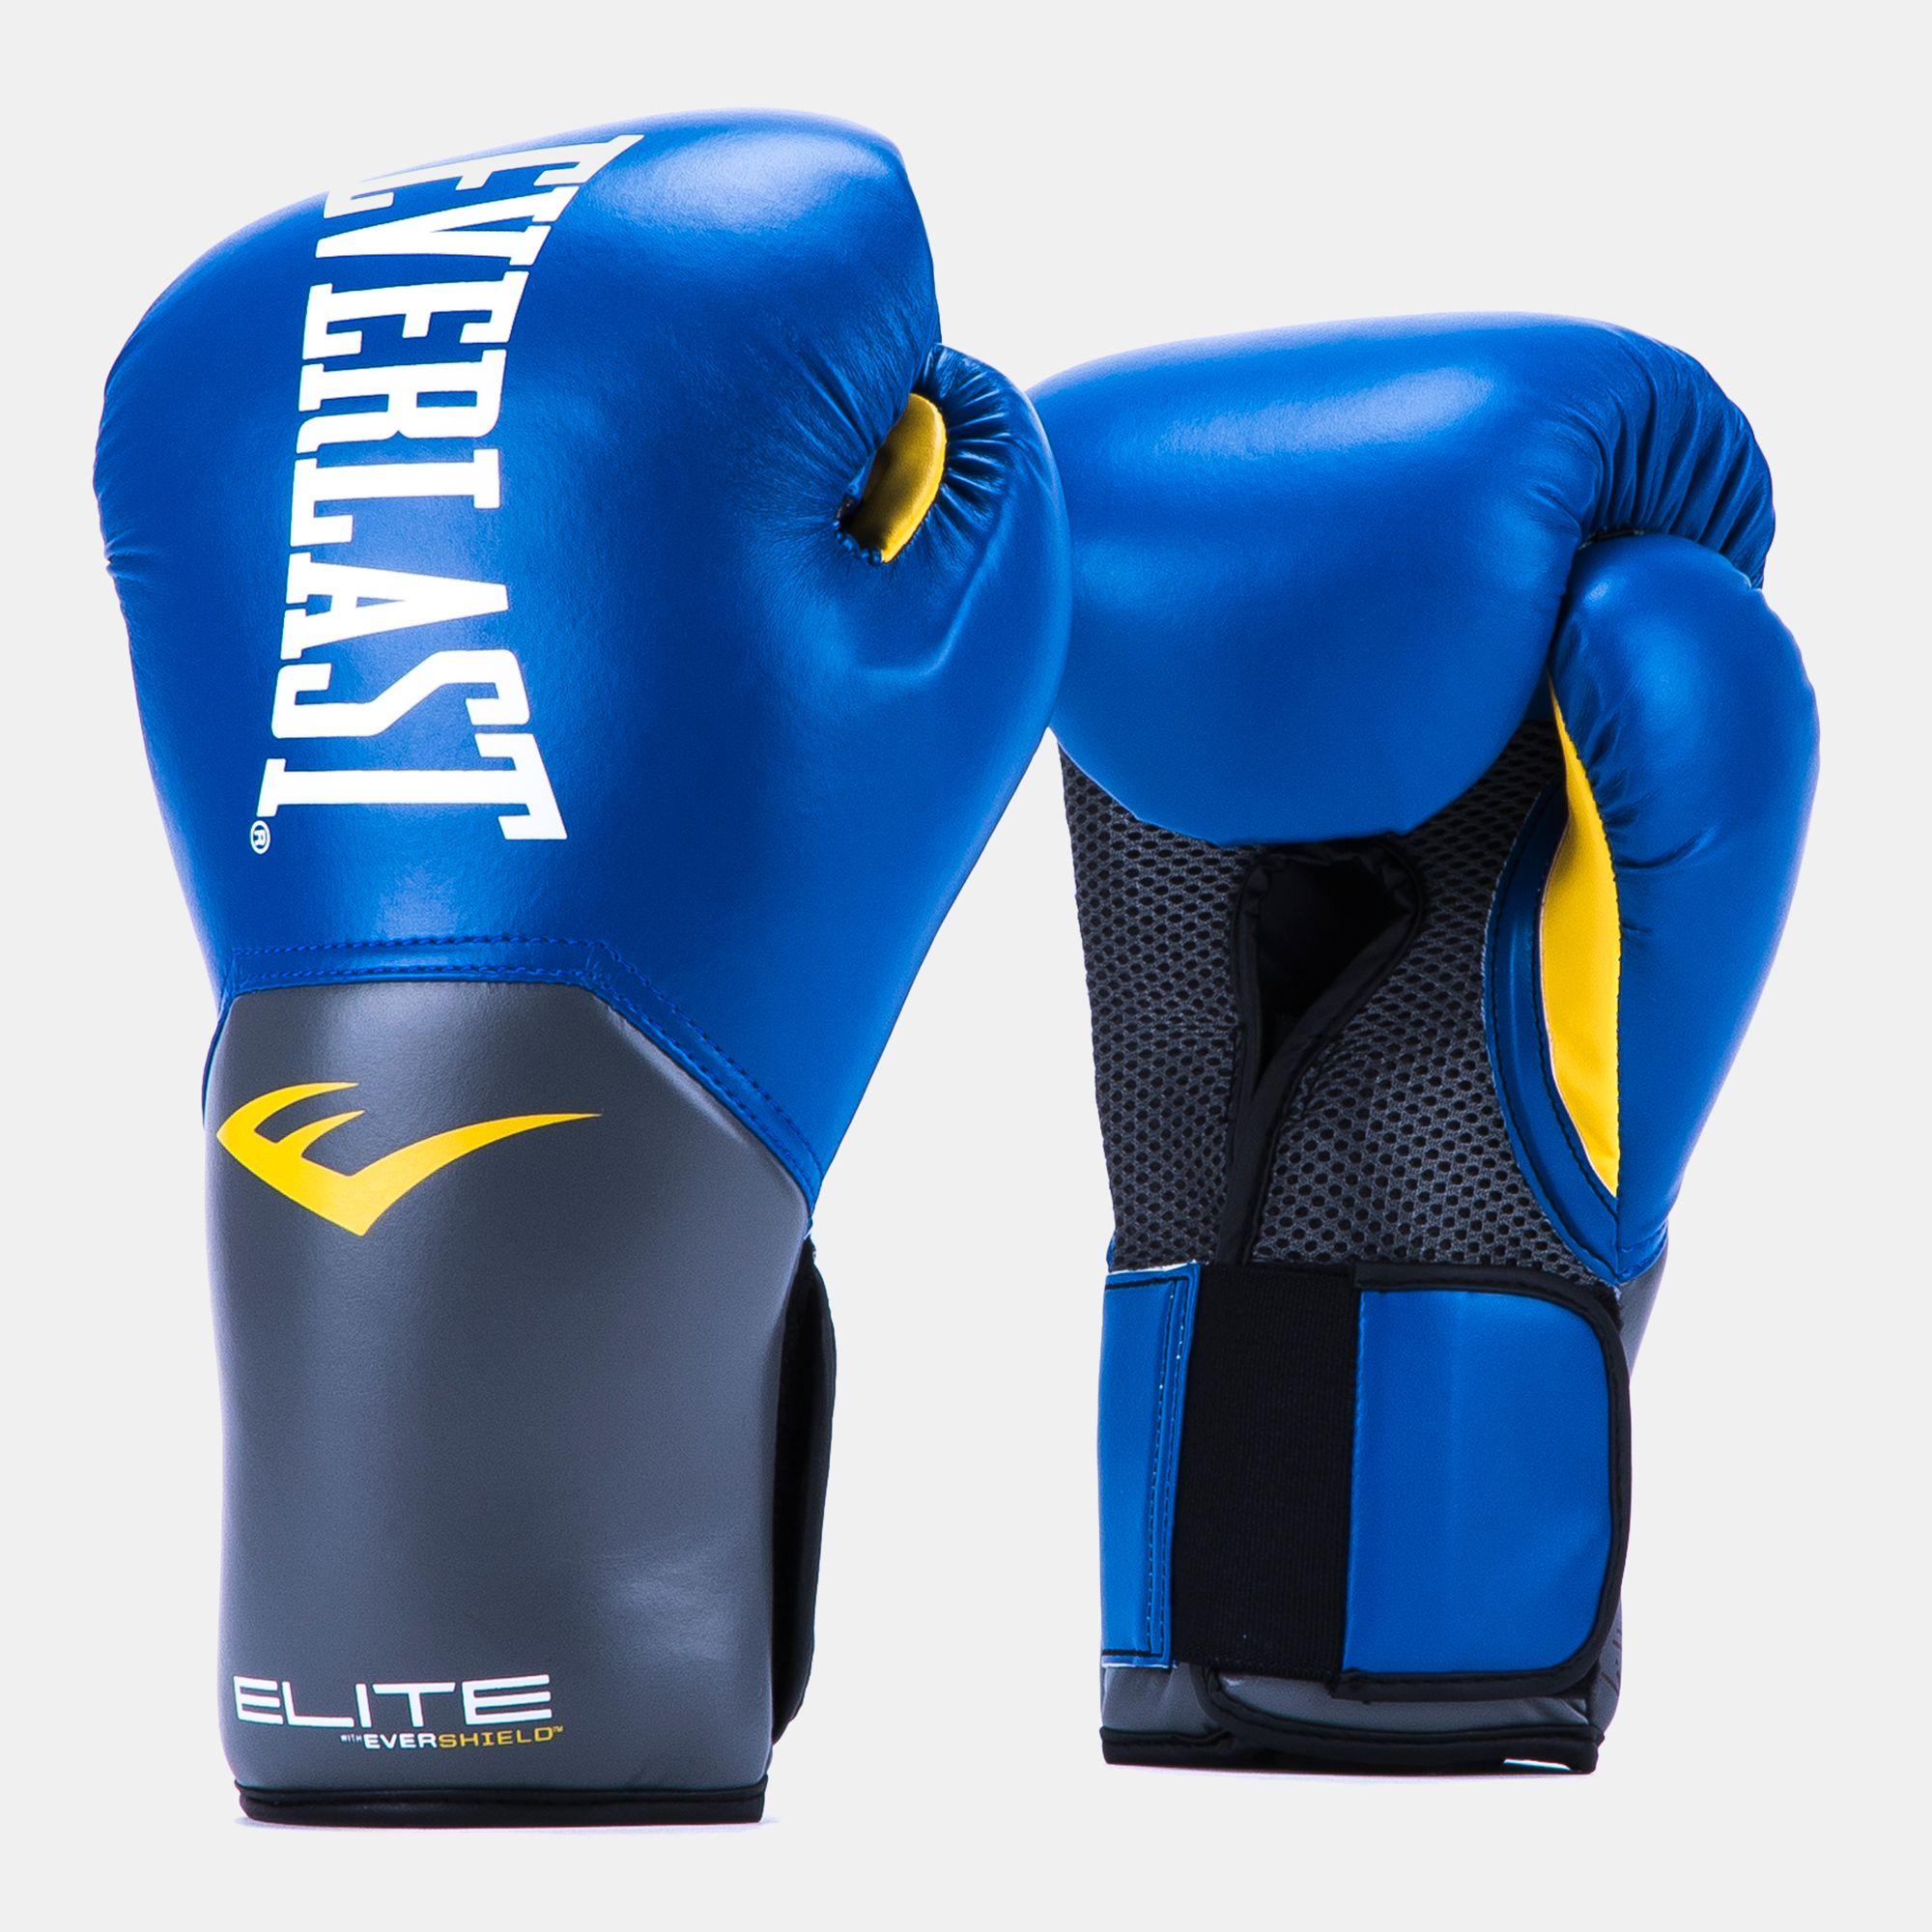 Everlast Pro Style Elite 14oz Training Gloves - Red 86d025bc2cca